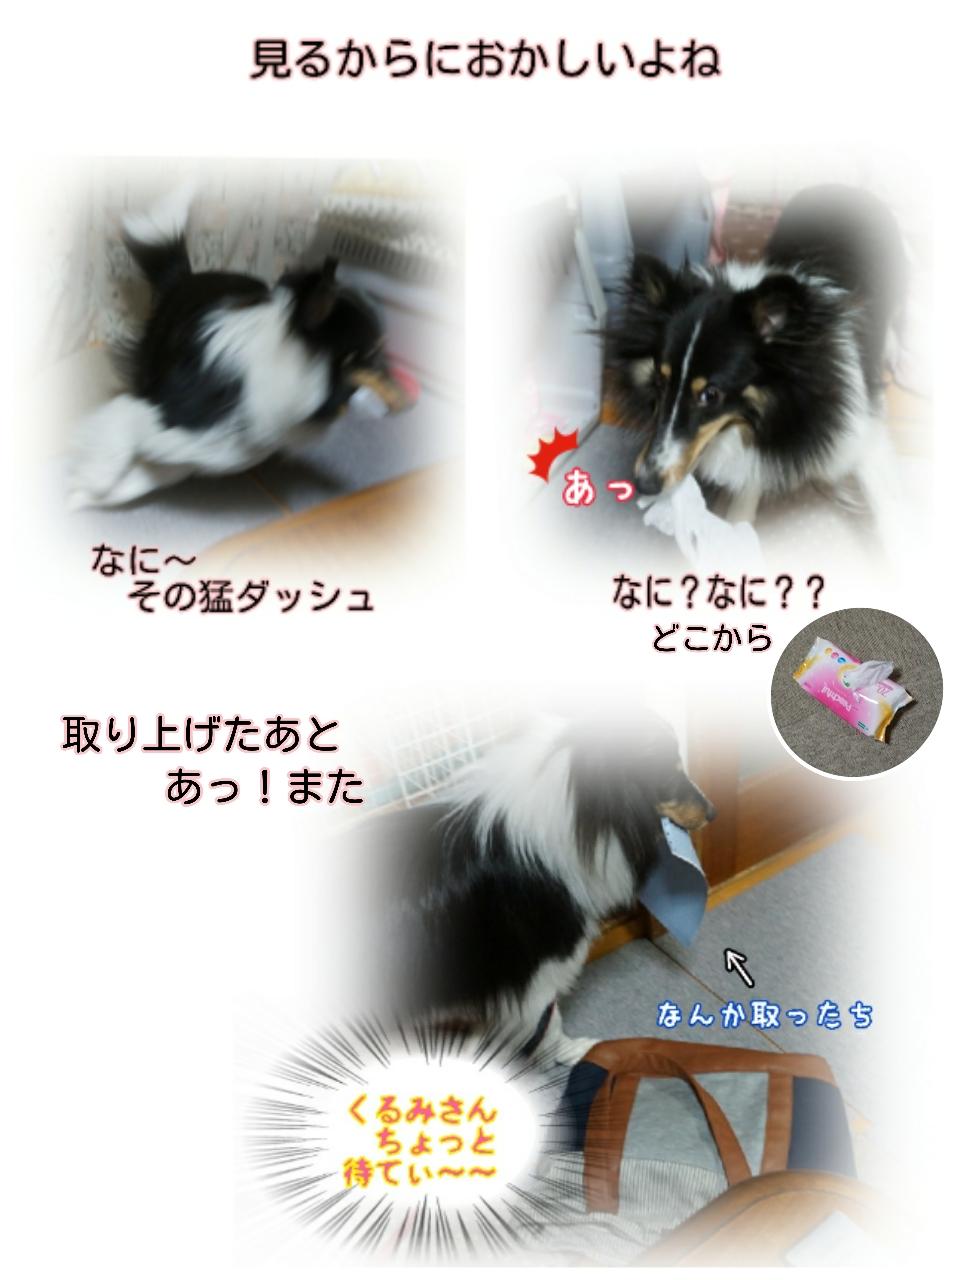 16-04-15-15-09-19-816_deco.jpg